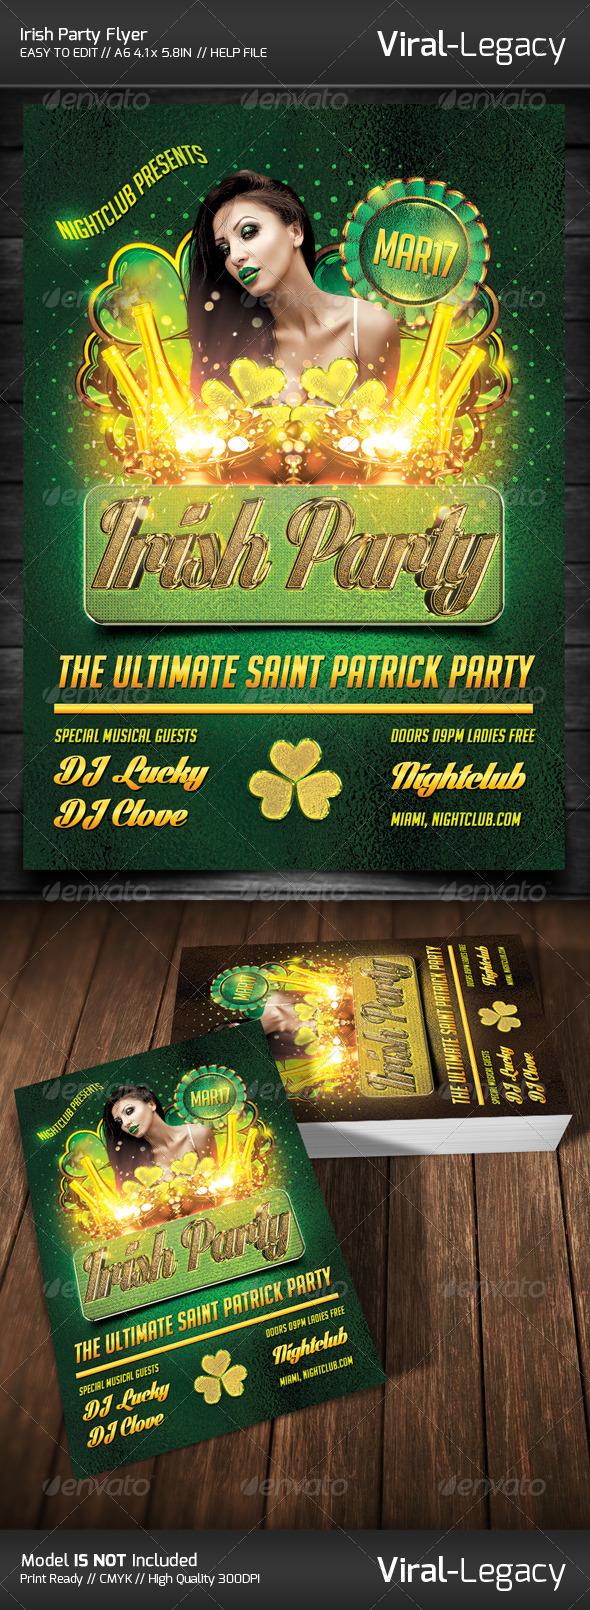 Saint Patrick Irish Party Flyer - Clubs & Parties Events